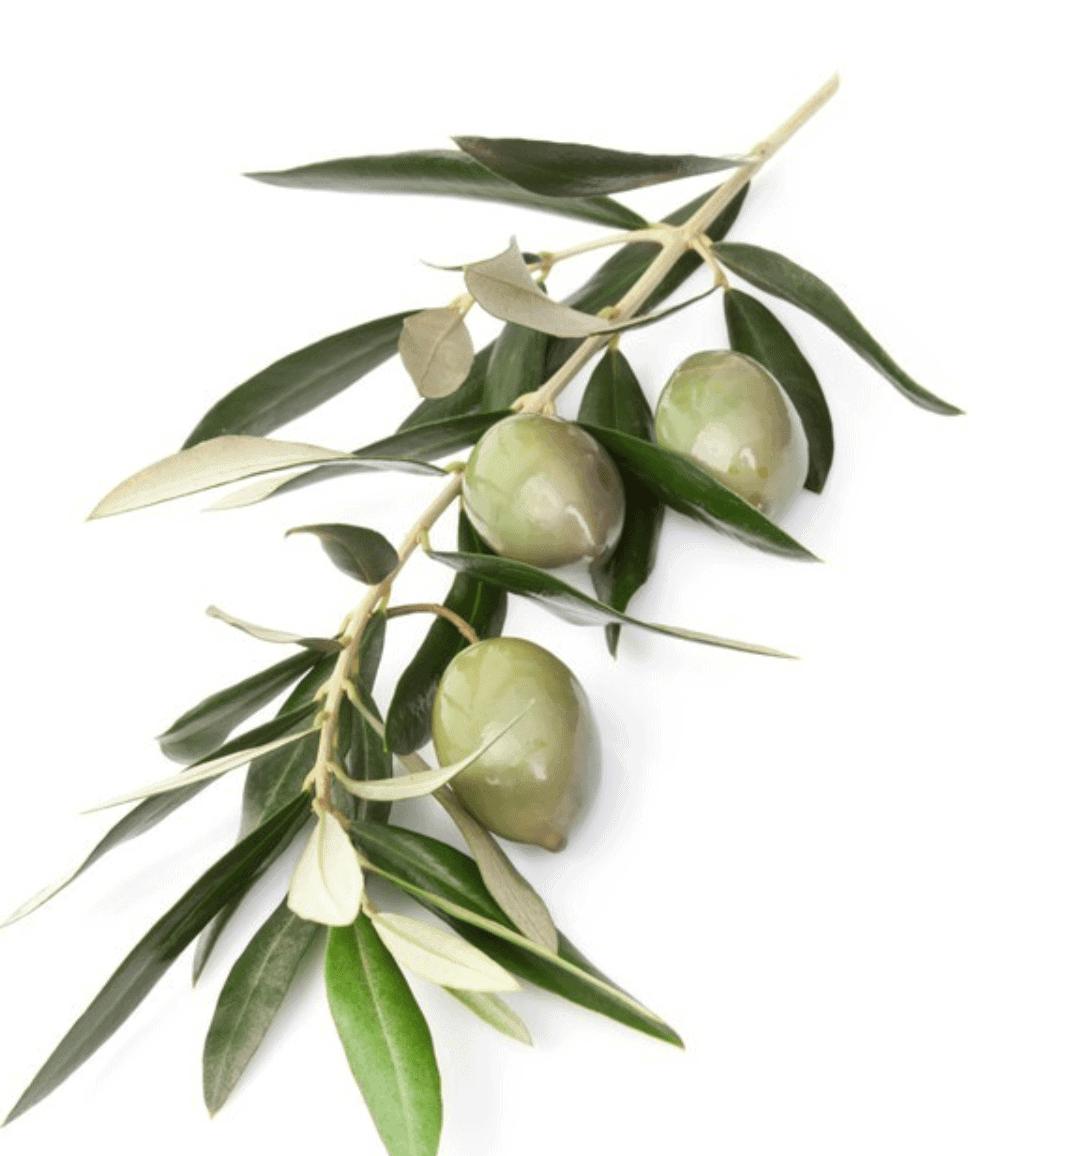 Herbs 44 - Ellia Natural Cosmetics - Cyprus Europe